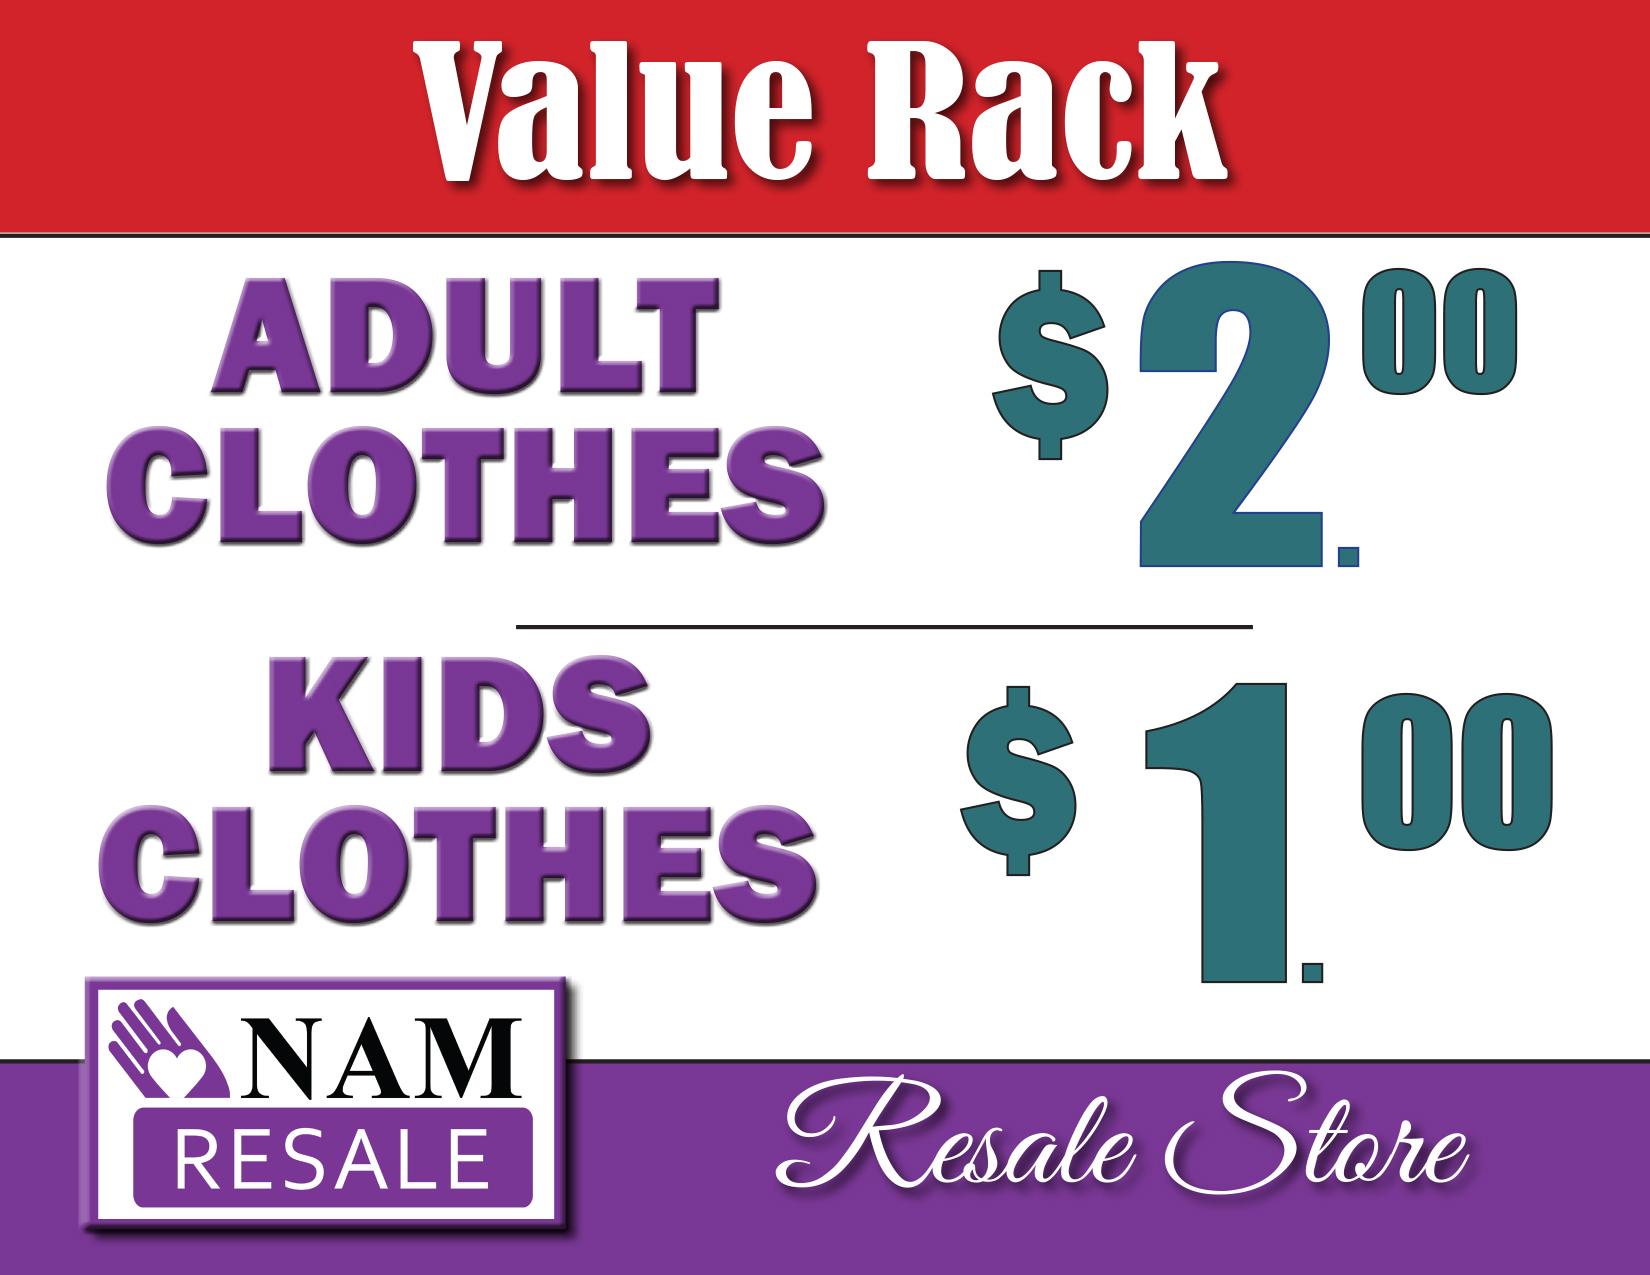 Value Rack